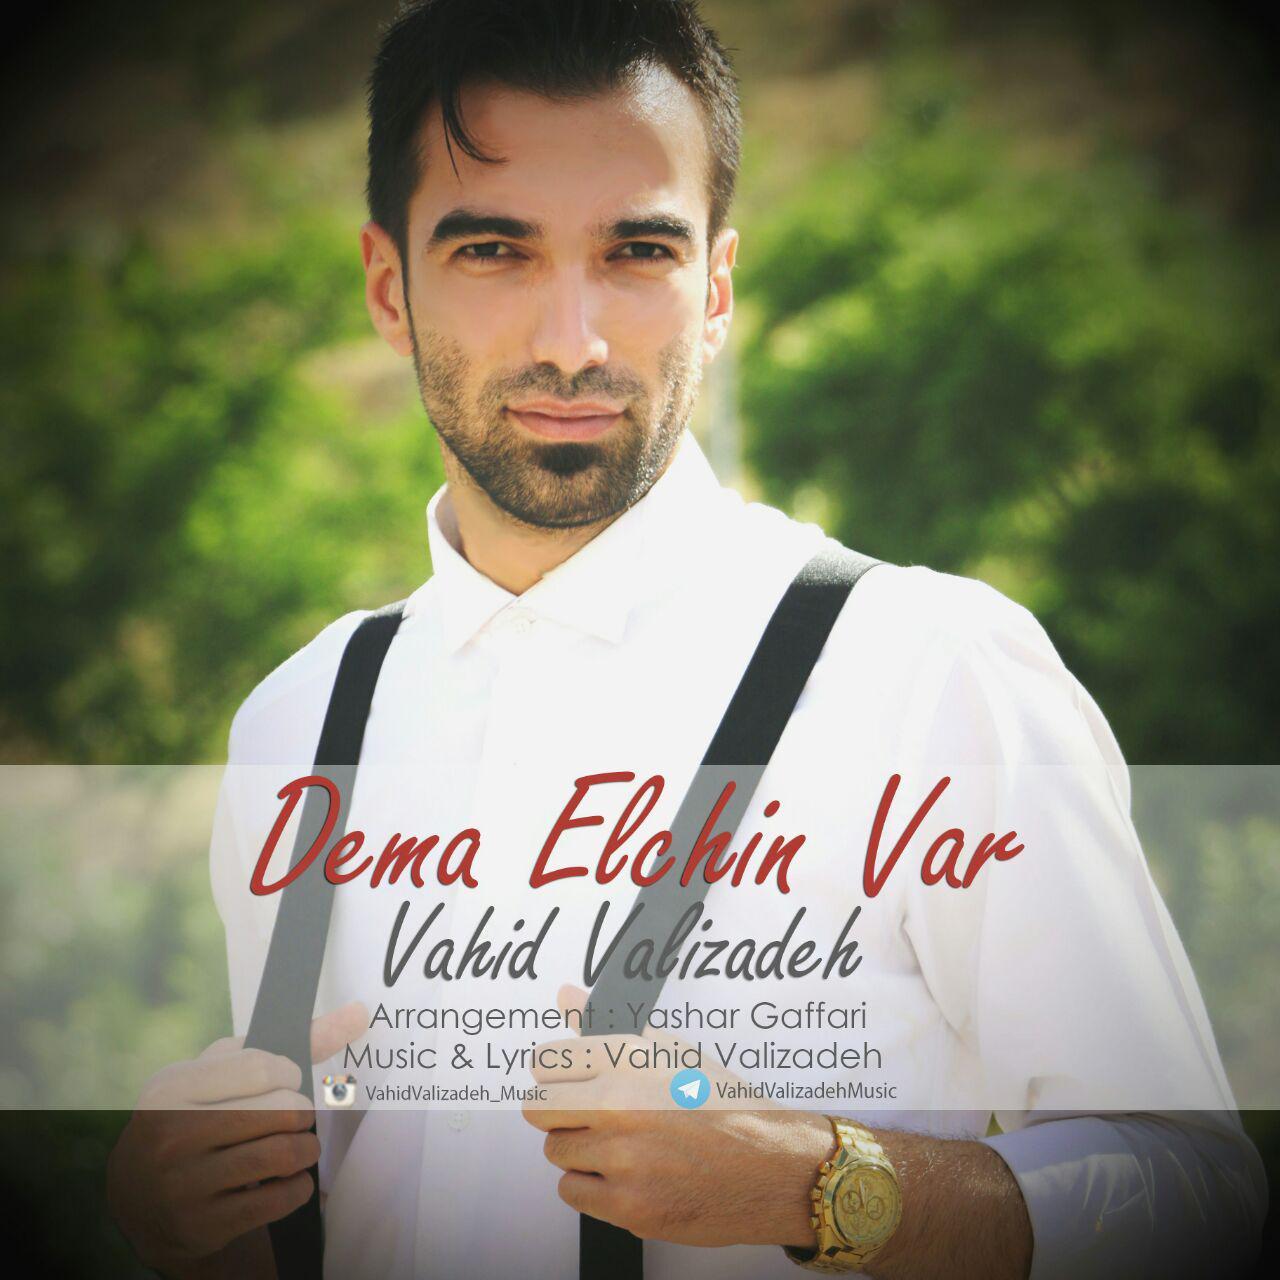 http://s9.picofile.com/file/8301222626/006Vahid_Valizadeh_Dema_Elchin_Var.jpg